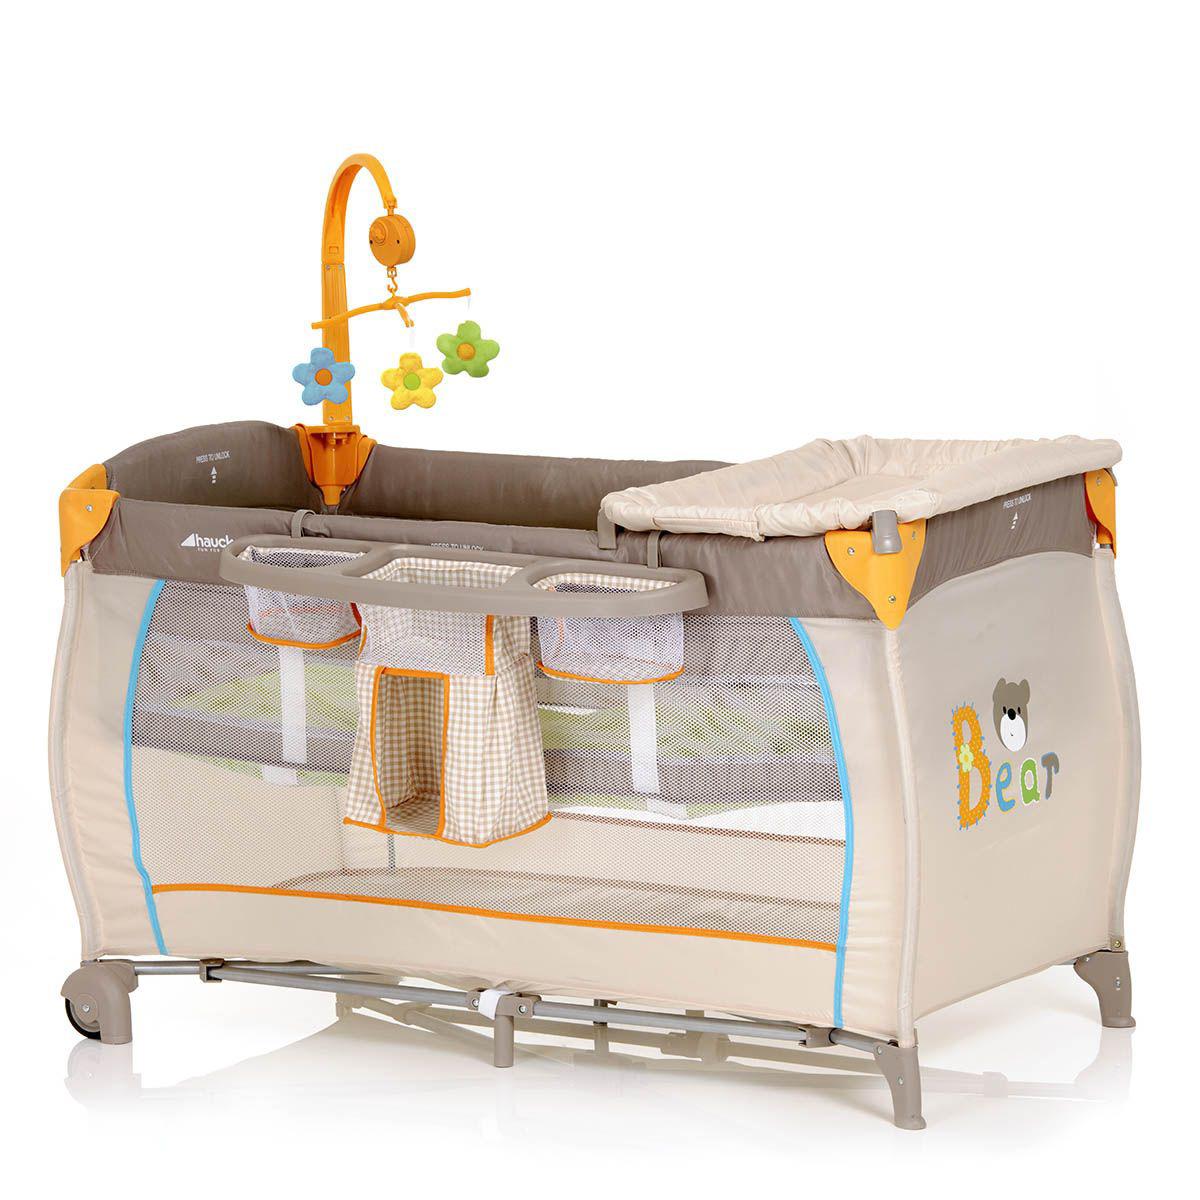 Rostouc n d tsk cestovn post lka hauck for Baby play centre